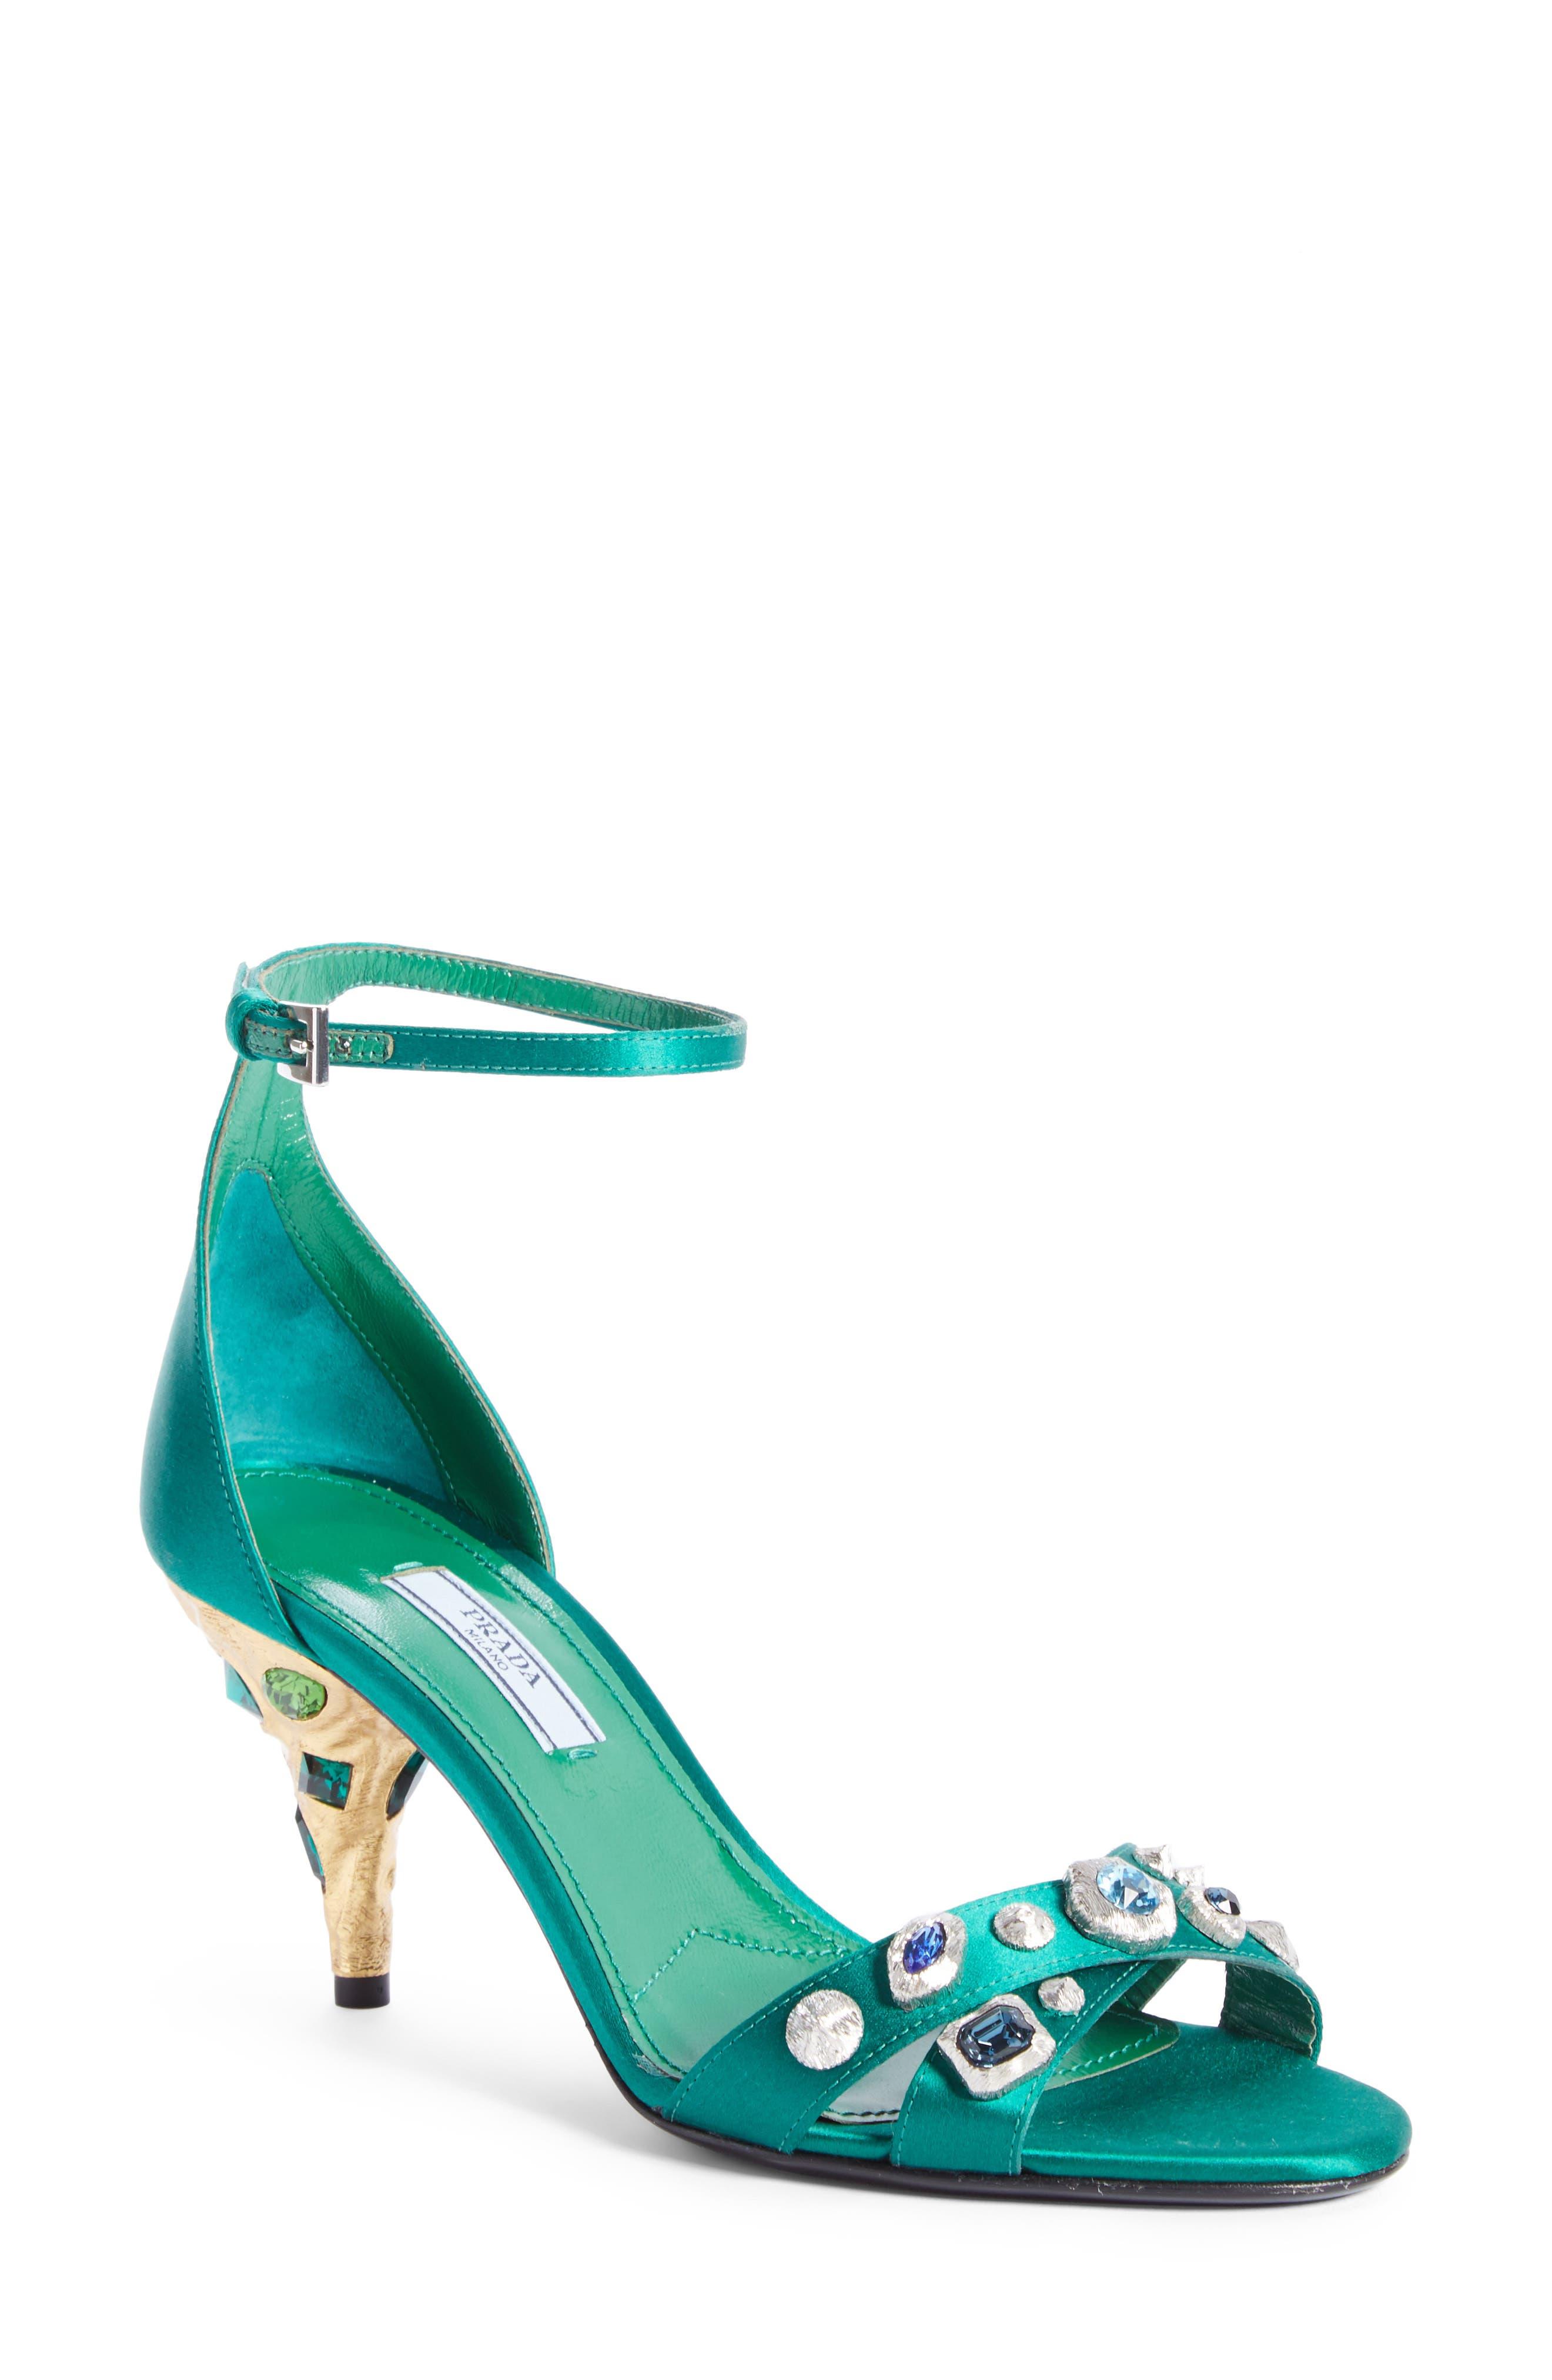 Alternate Image 1 Selected - Prada Jewel Ankle Strap Sandal (Women)